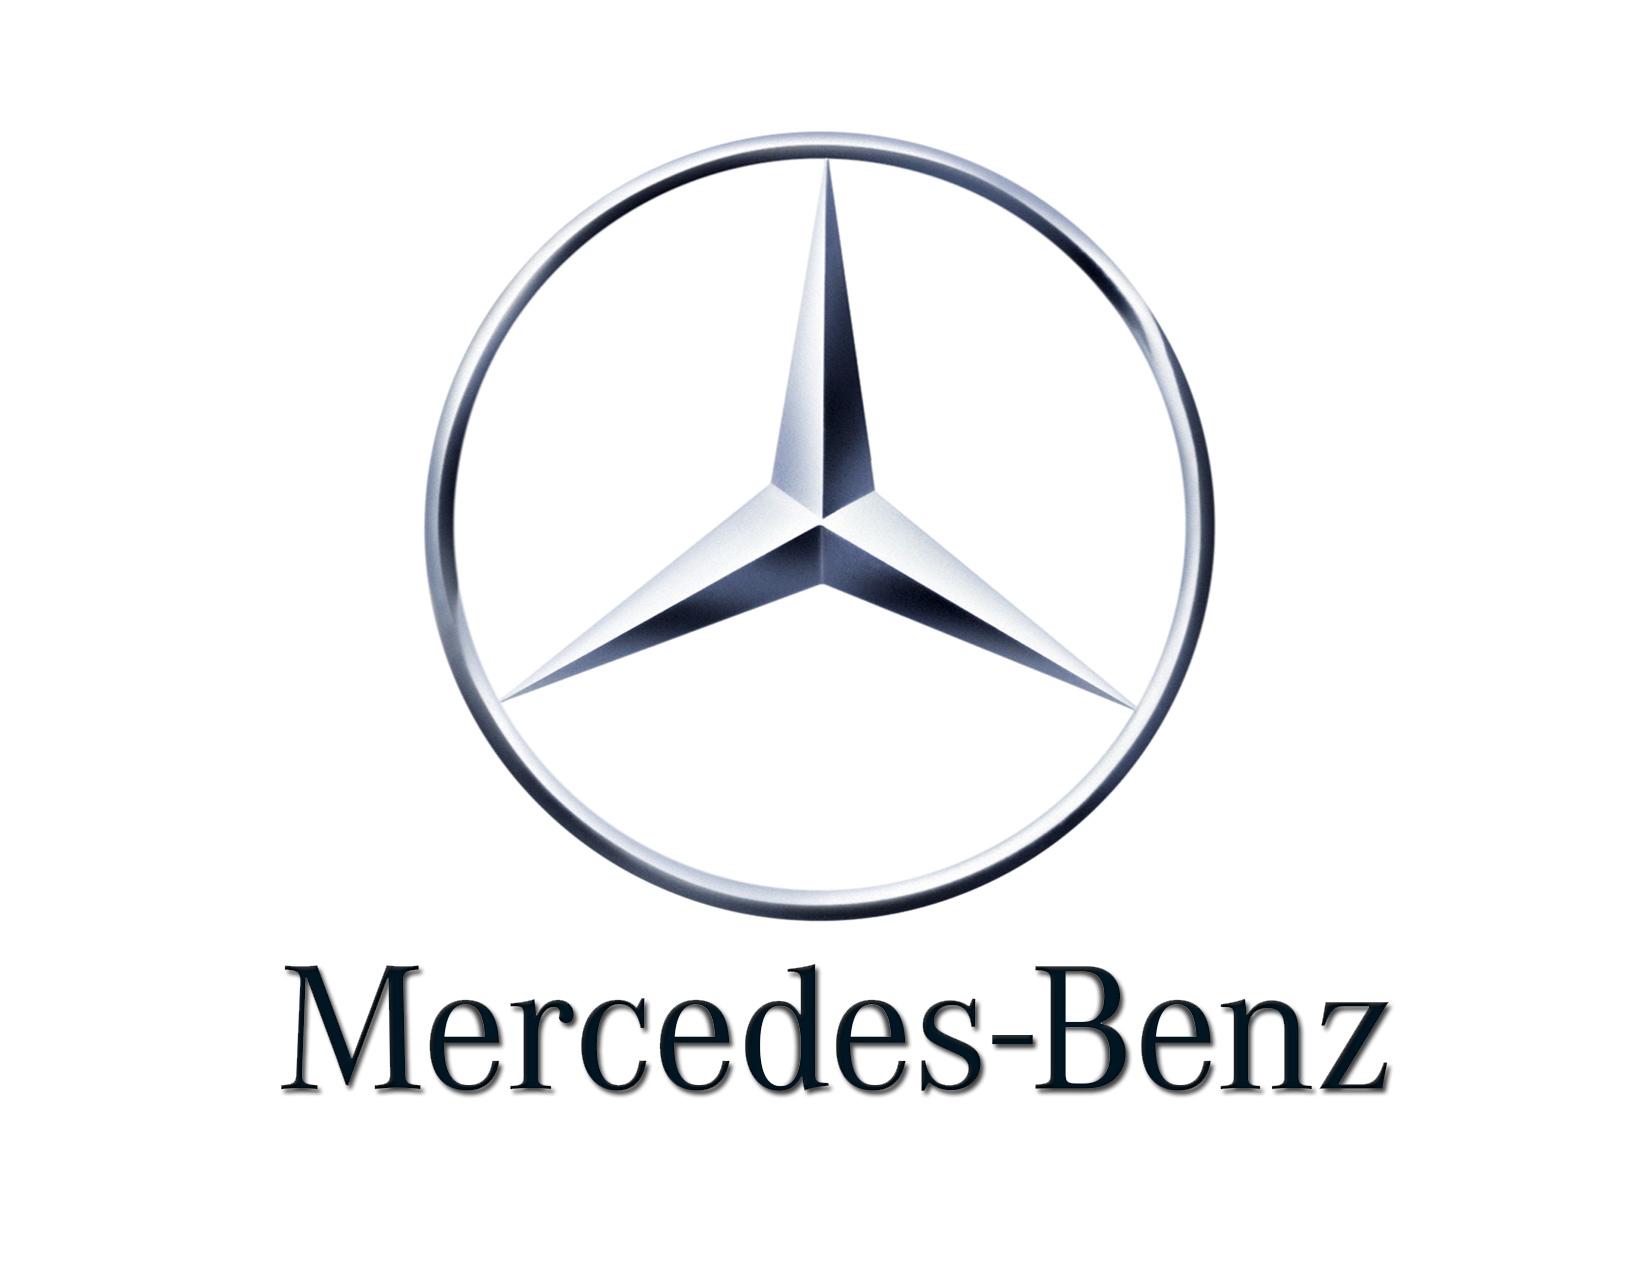 2014 - mercedes benz